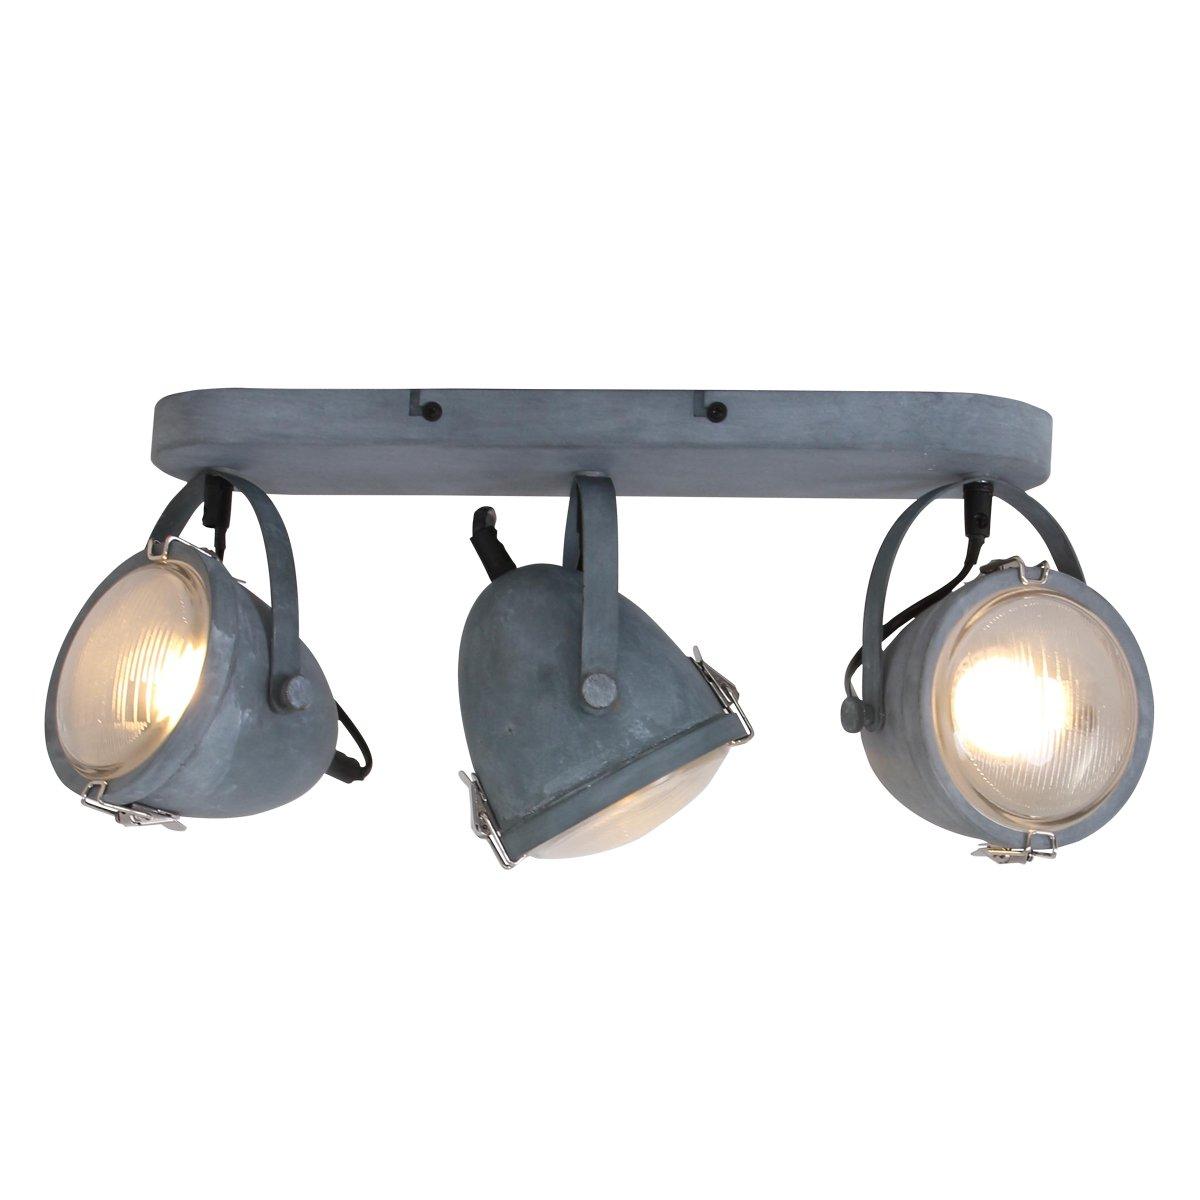 Lightning Industriele Wandlamp 3-L spot Medium Grijs